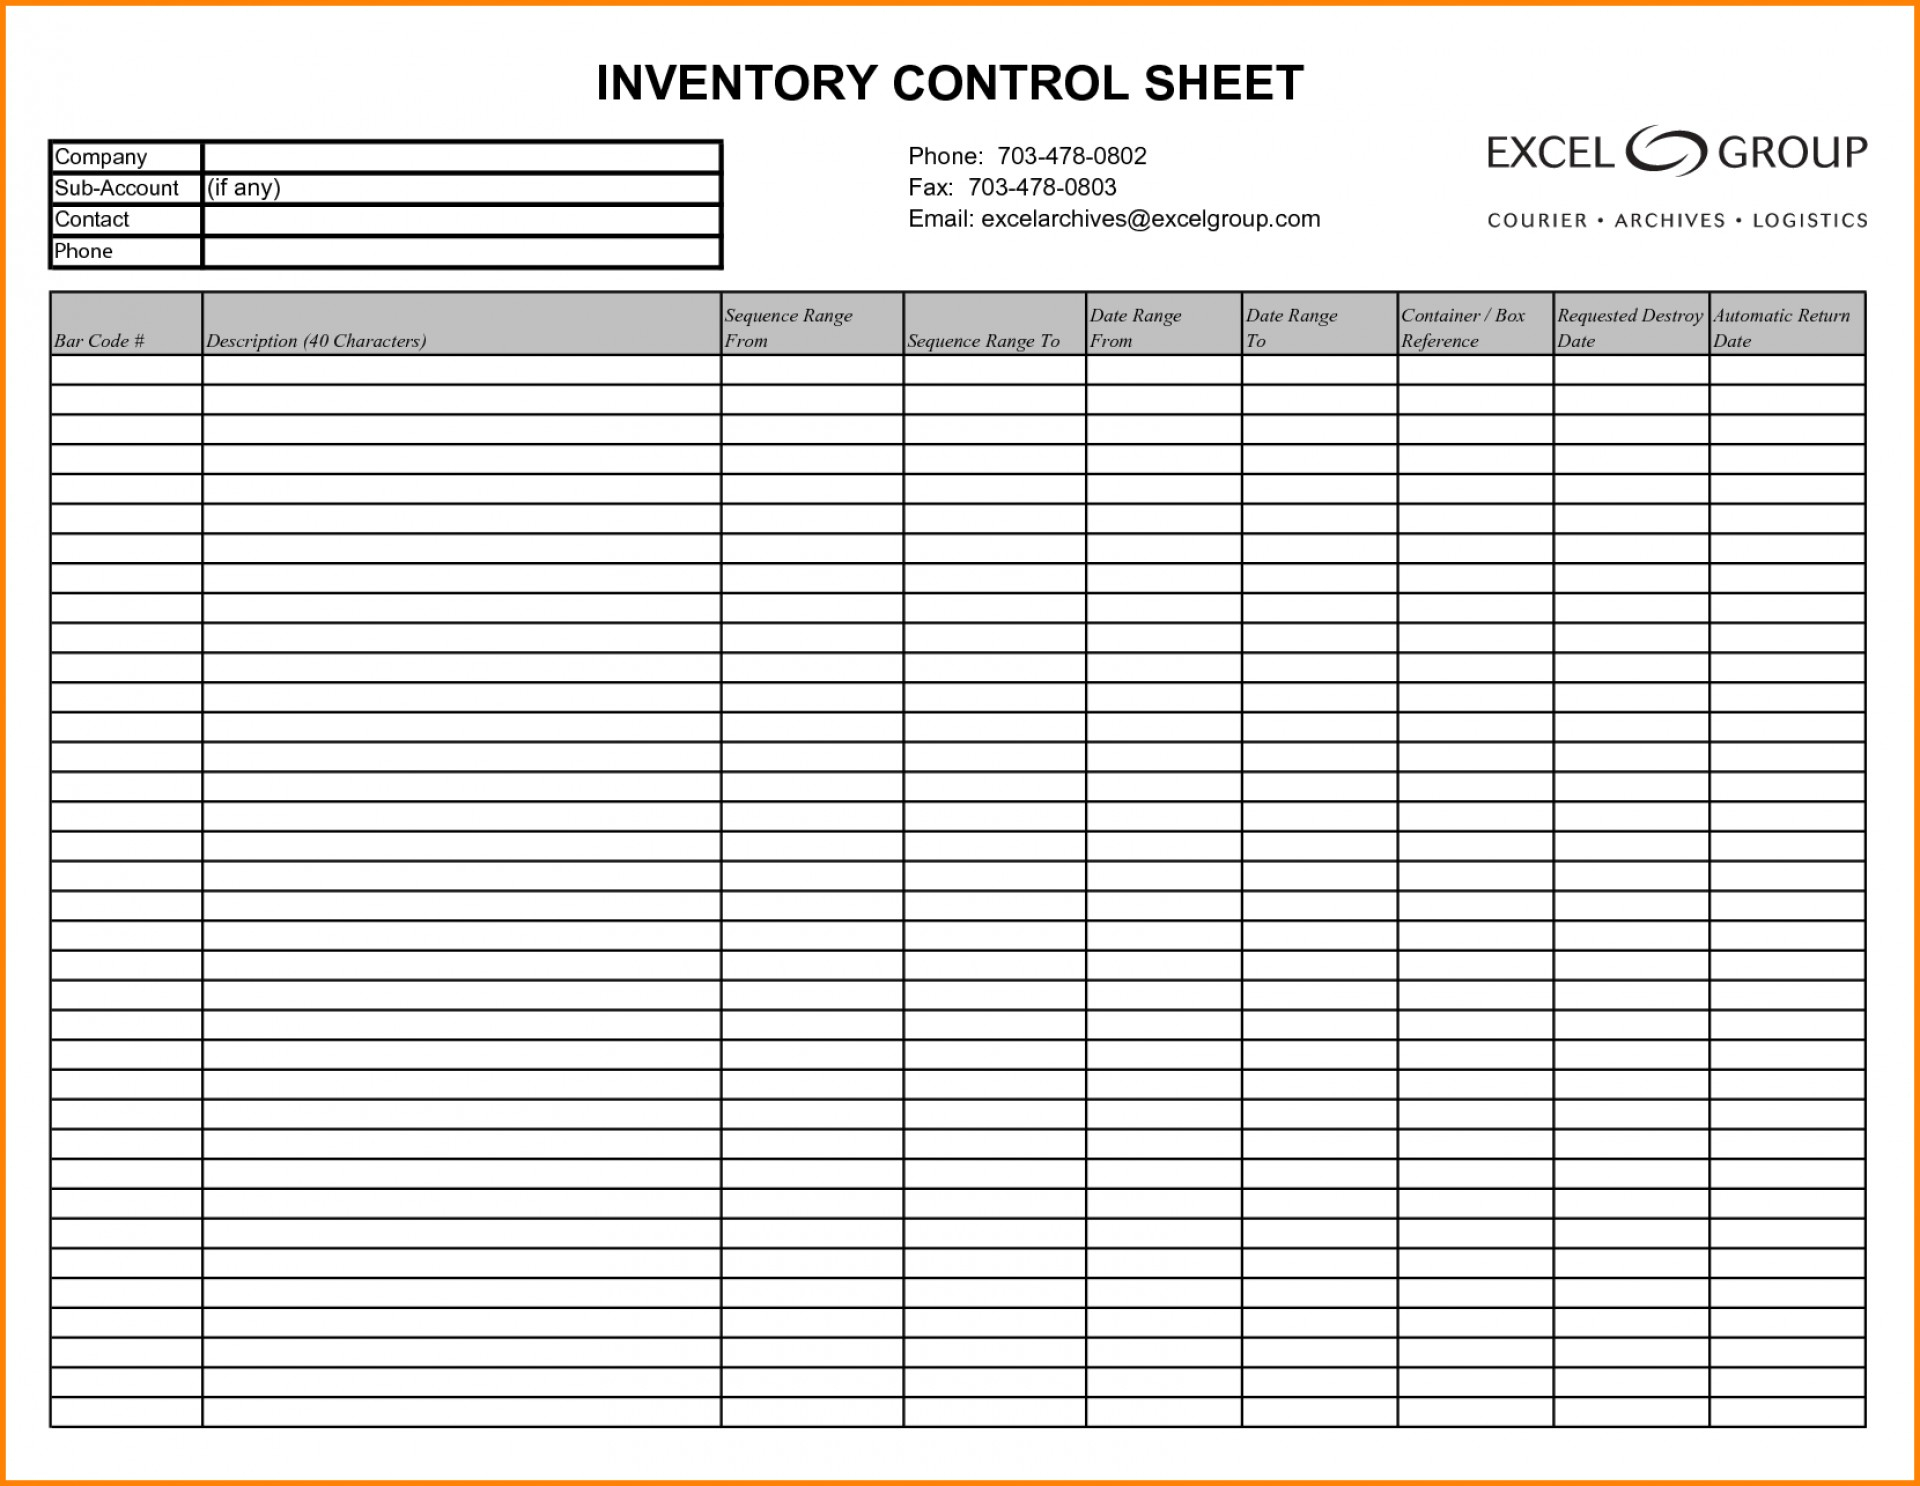 Ham Radio Logging Excel Spreadsheet For 012 Template Ideas Sign In Log Sheet ~ Ulyssesroom